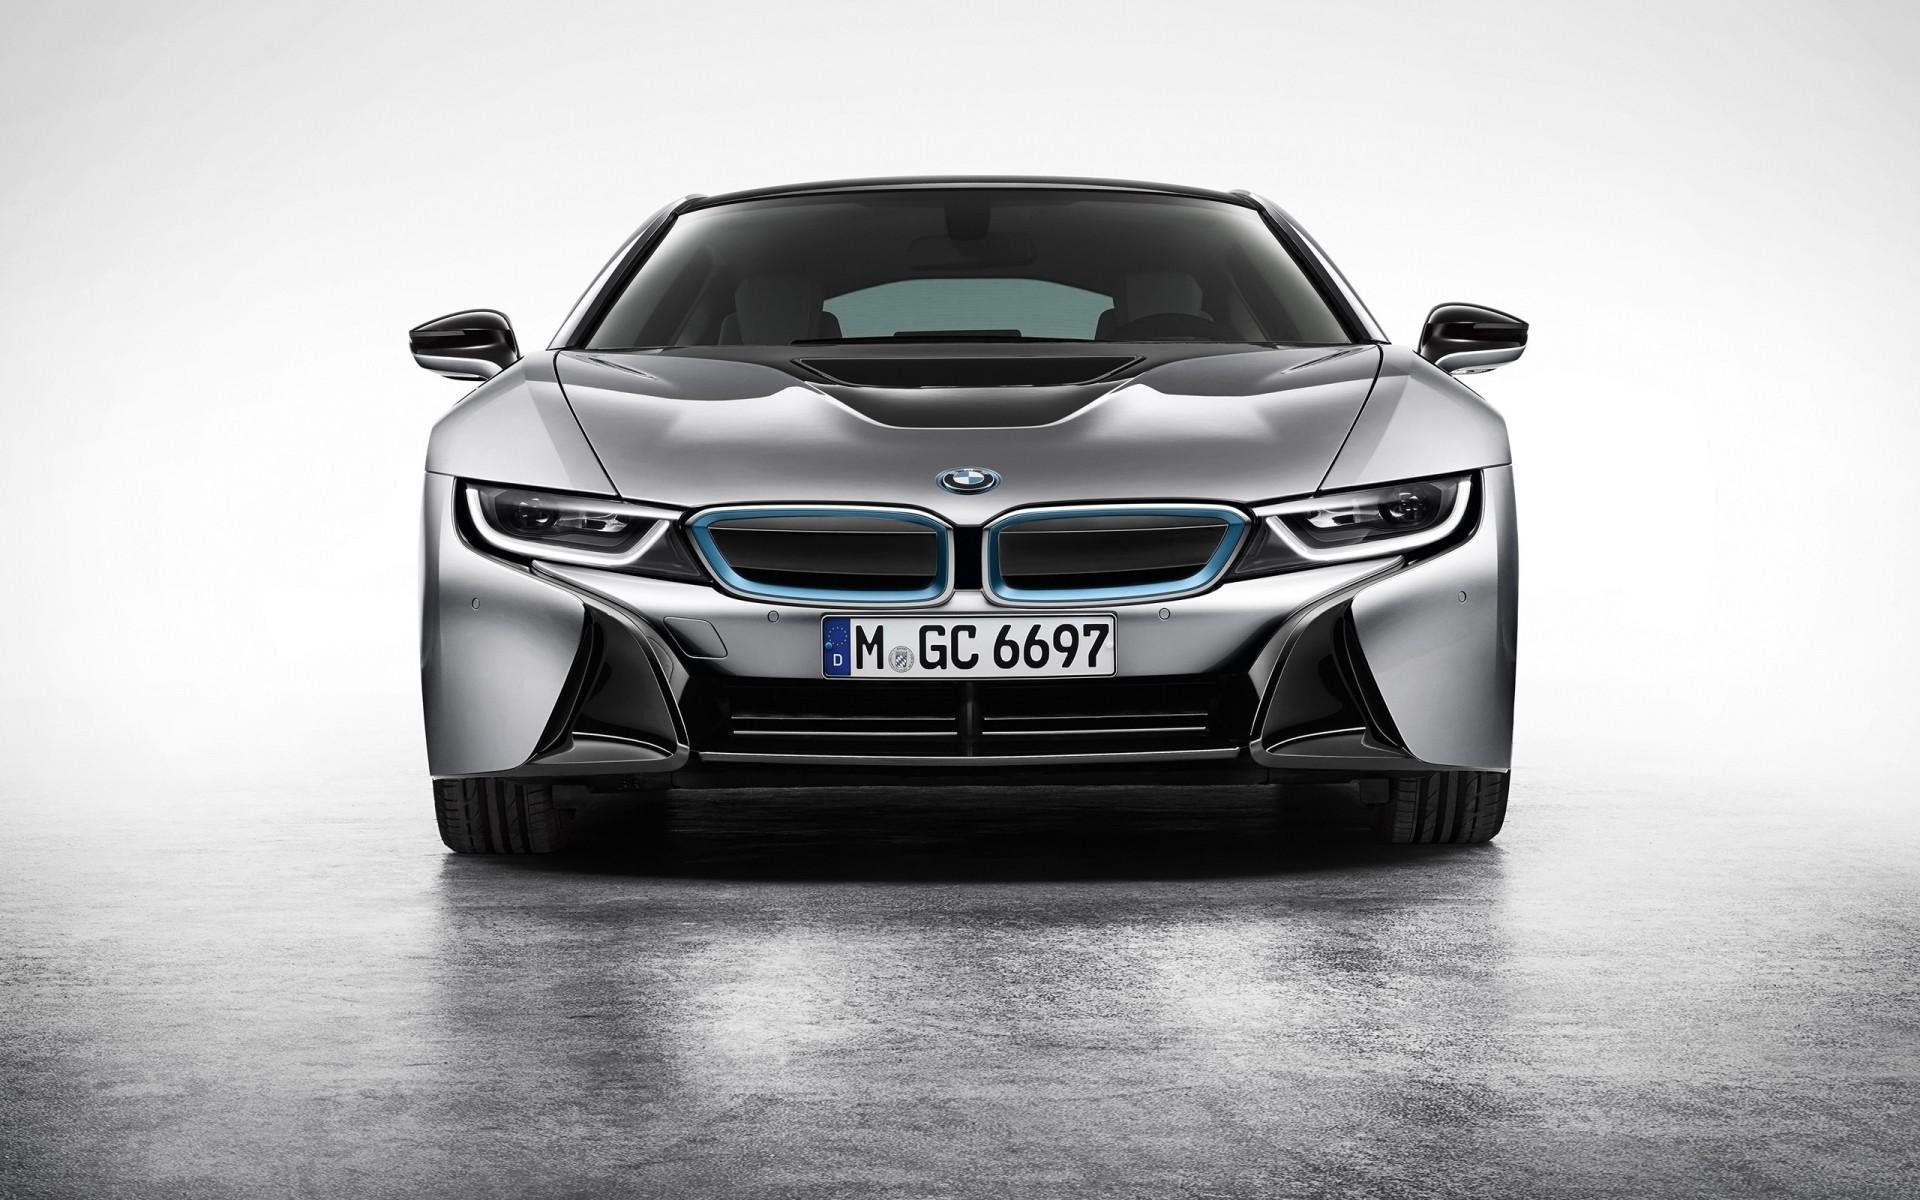 2015 BMW i8 5 Wallpaper | HD Car Wallpapers | ID #3806